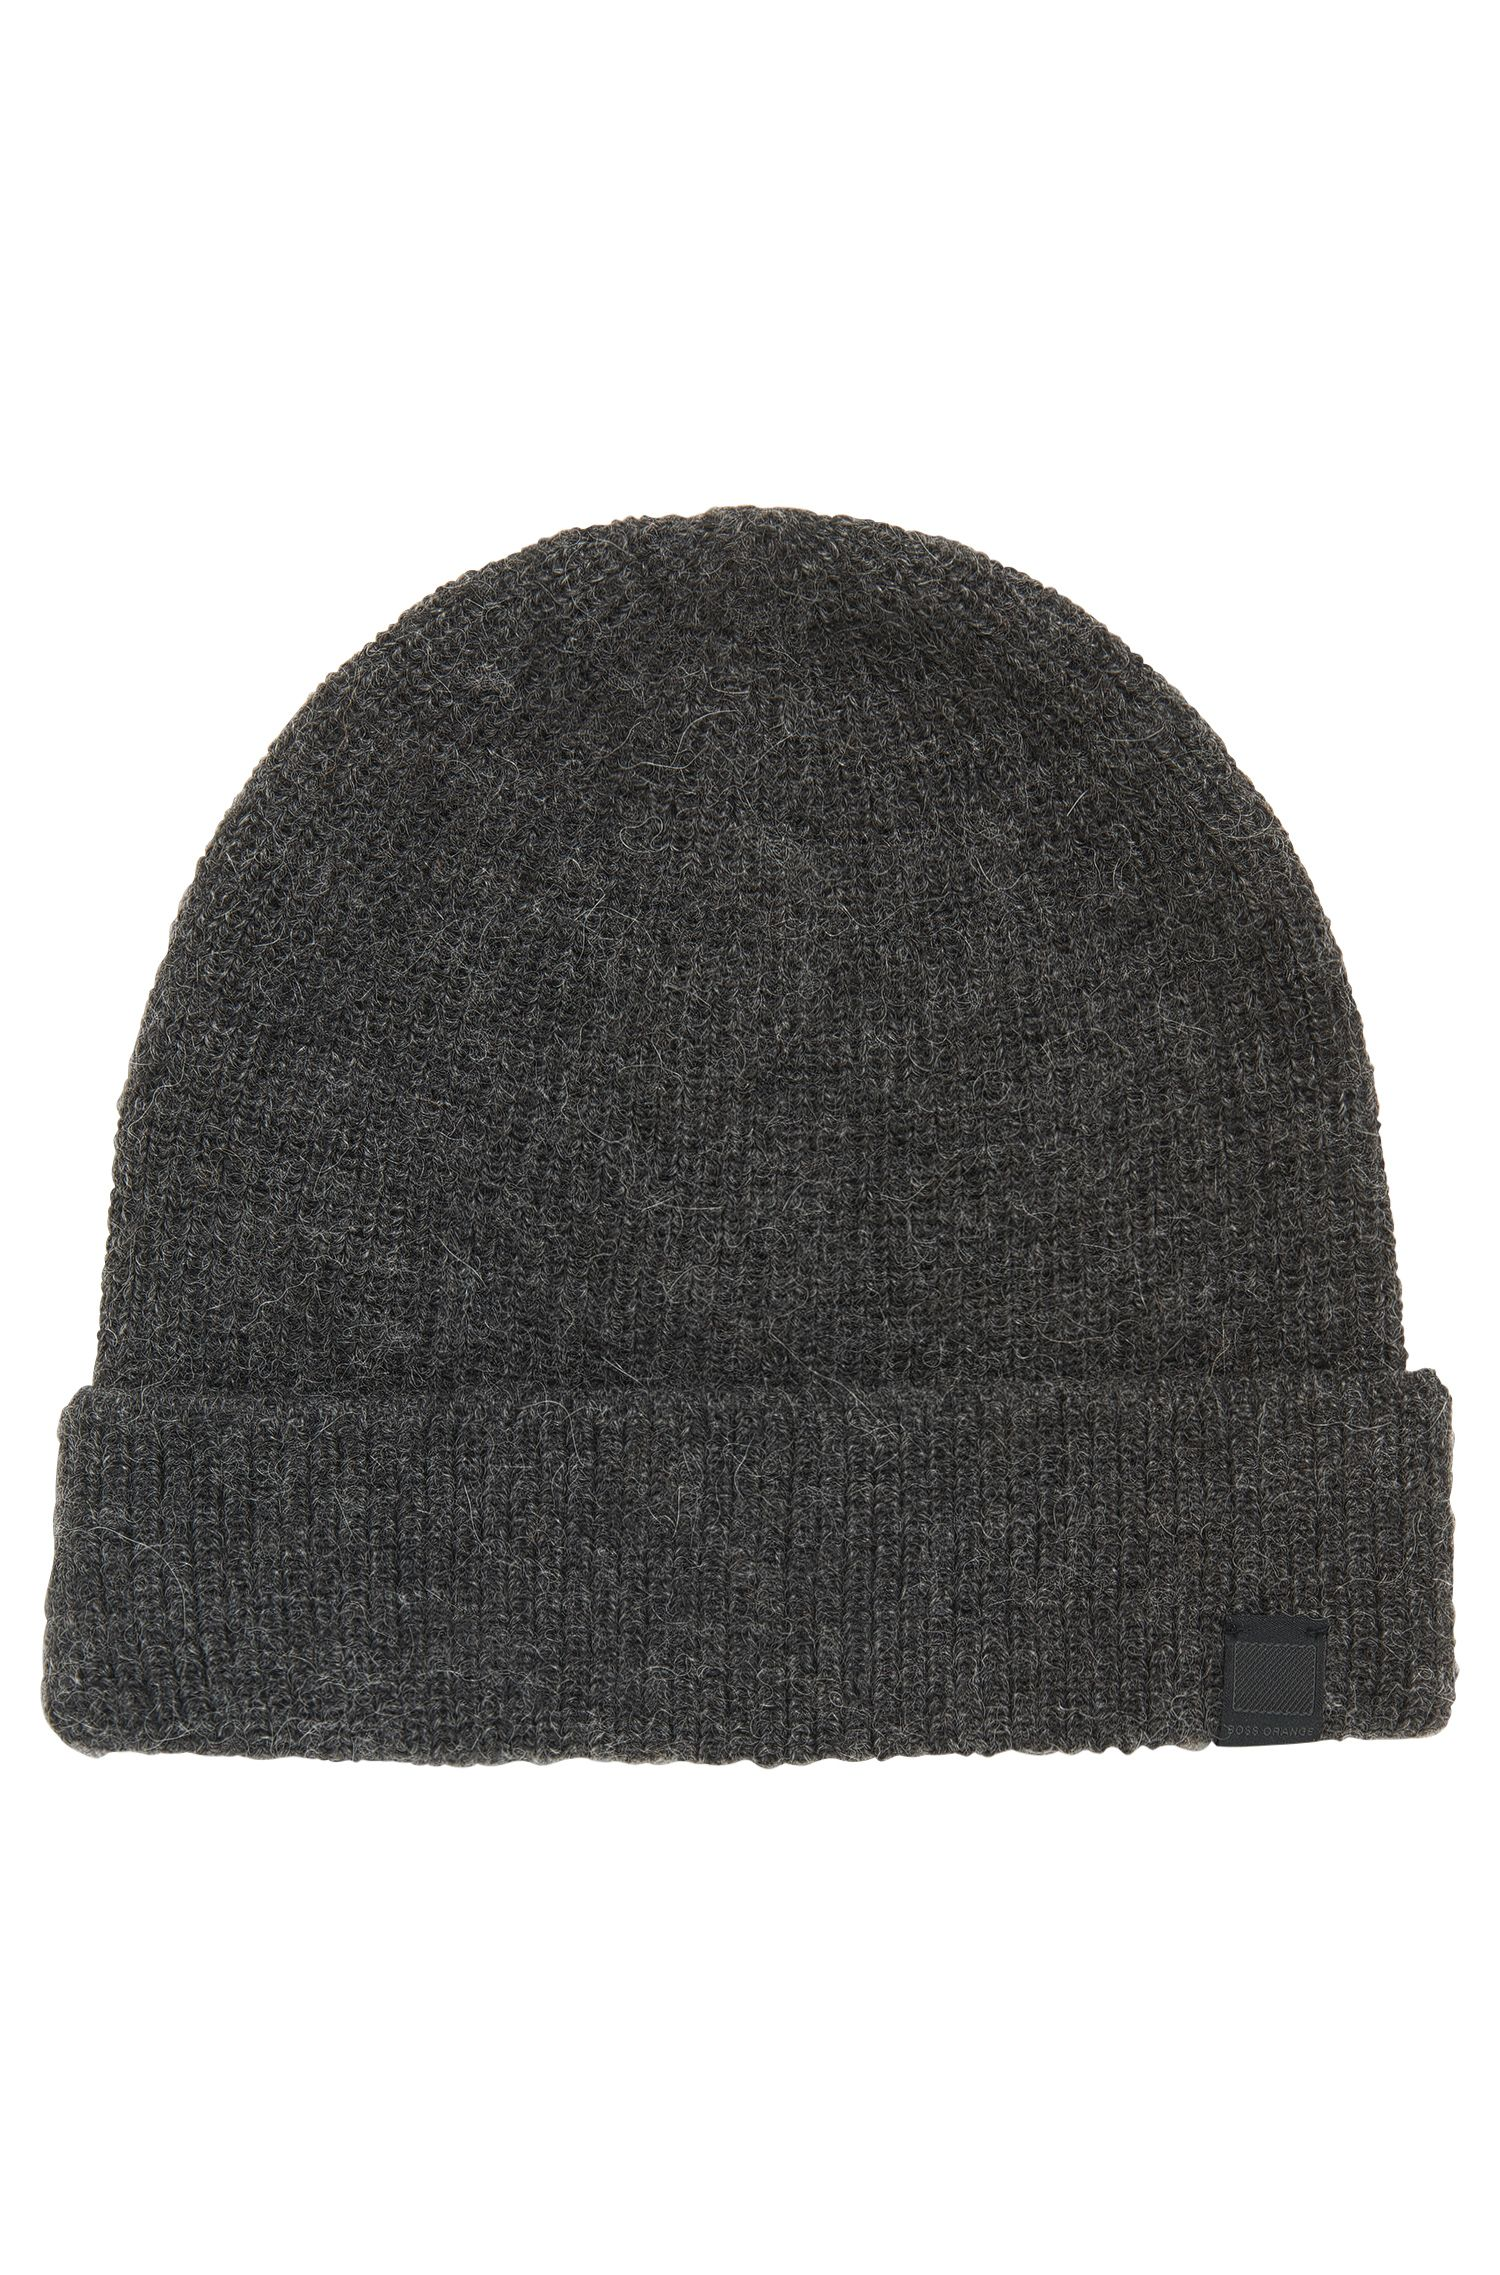 Mütze aus Alpaka